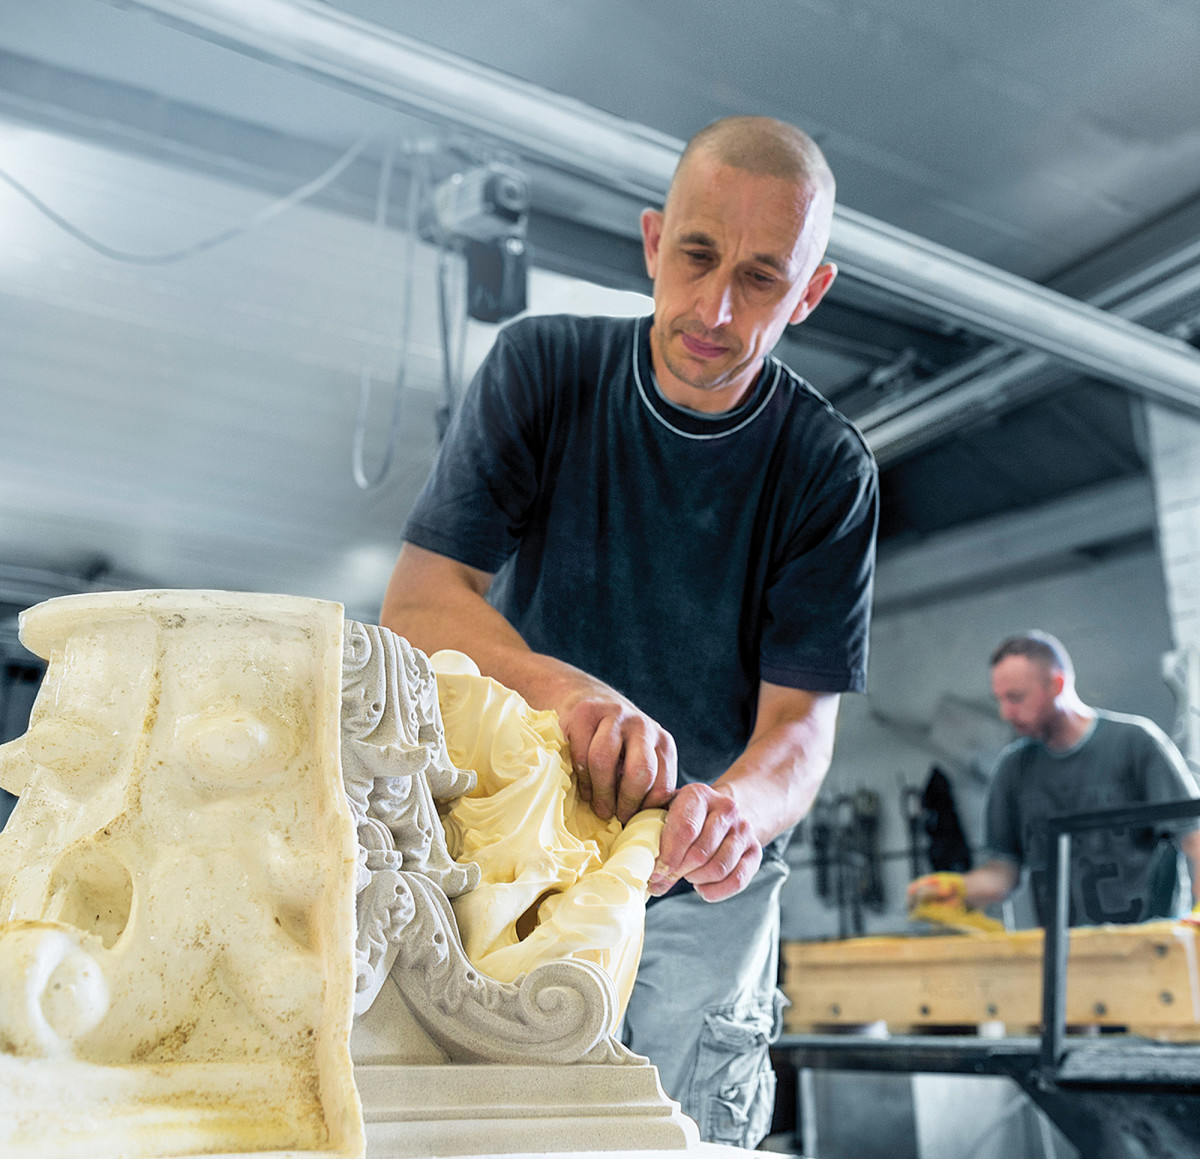 Haddonstone removing rubber mold